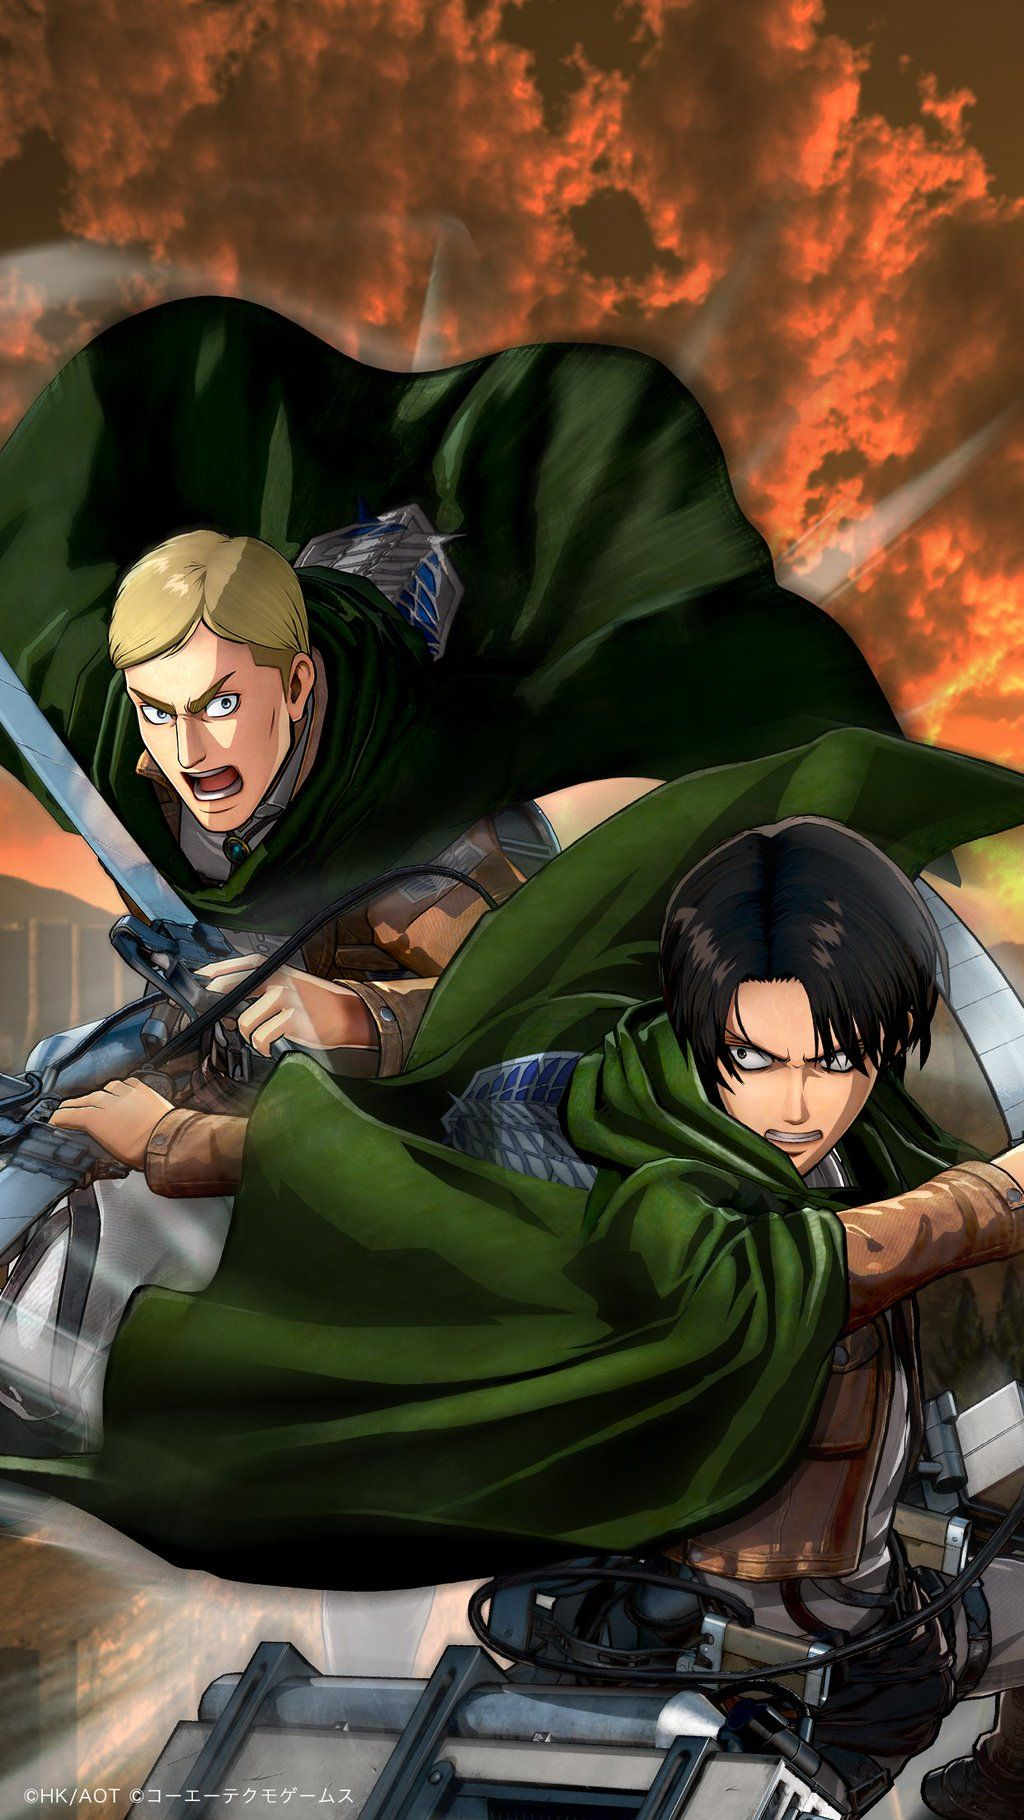 Erwin Smith Tumblr Attack On Titan Anime Attack On Titan Levi Levi And Erwin